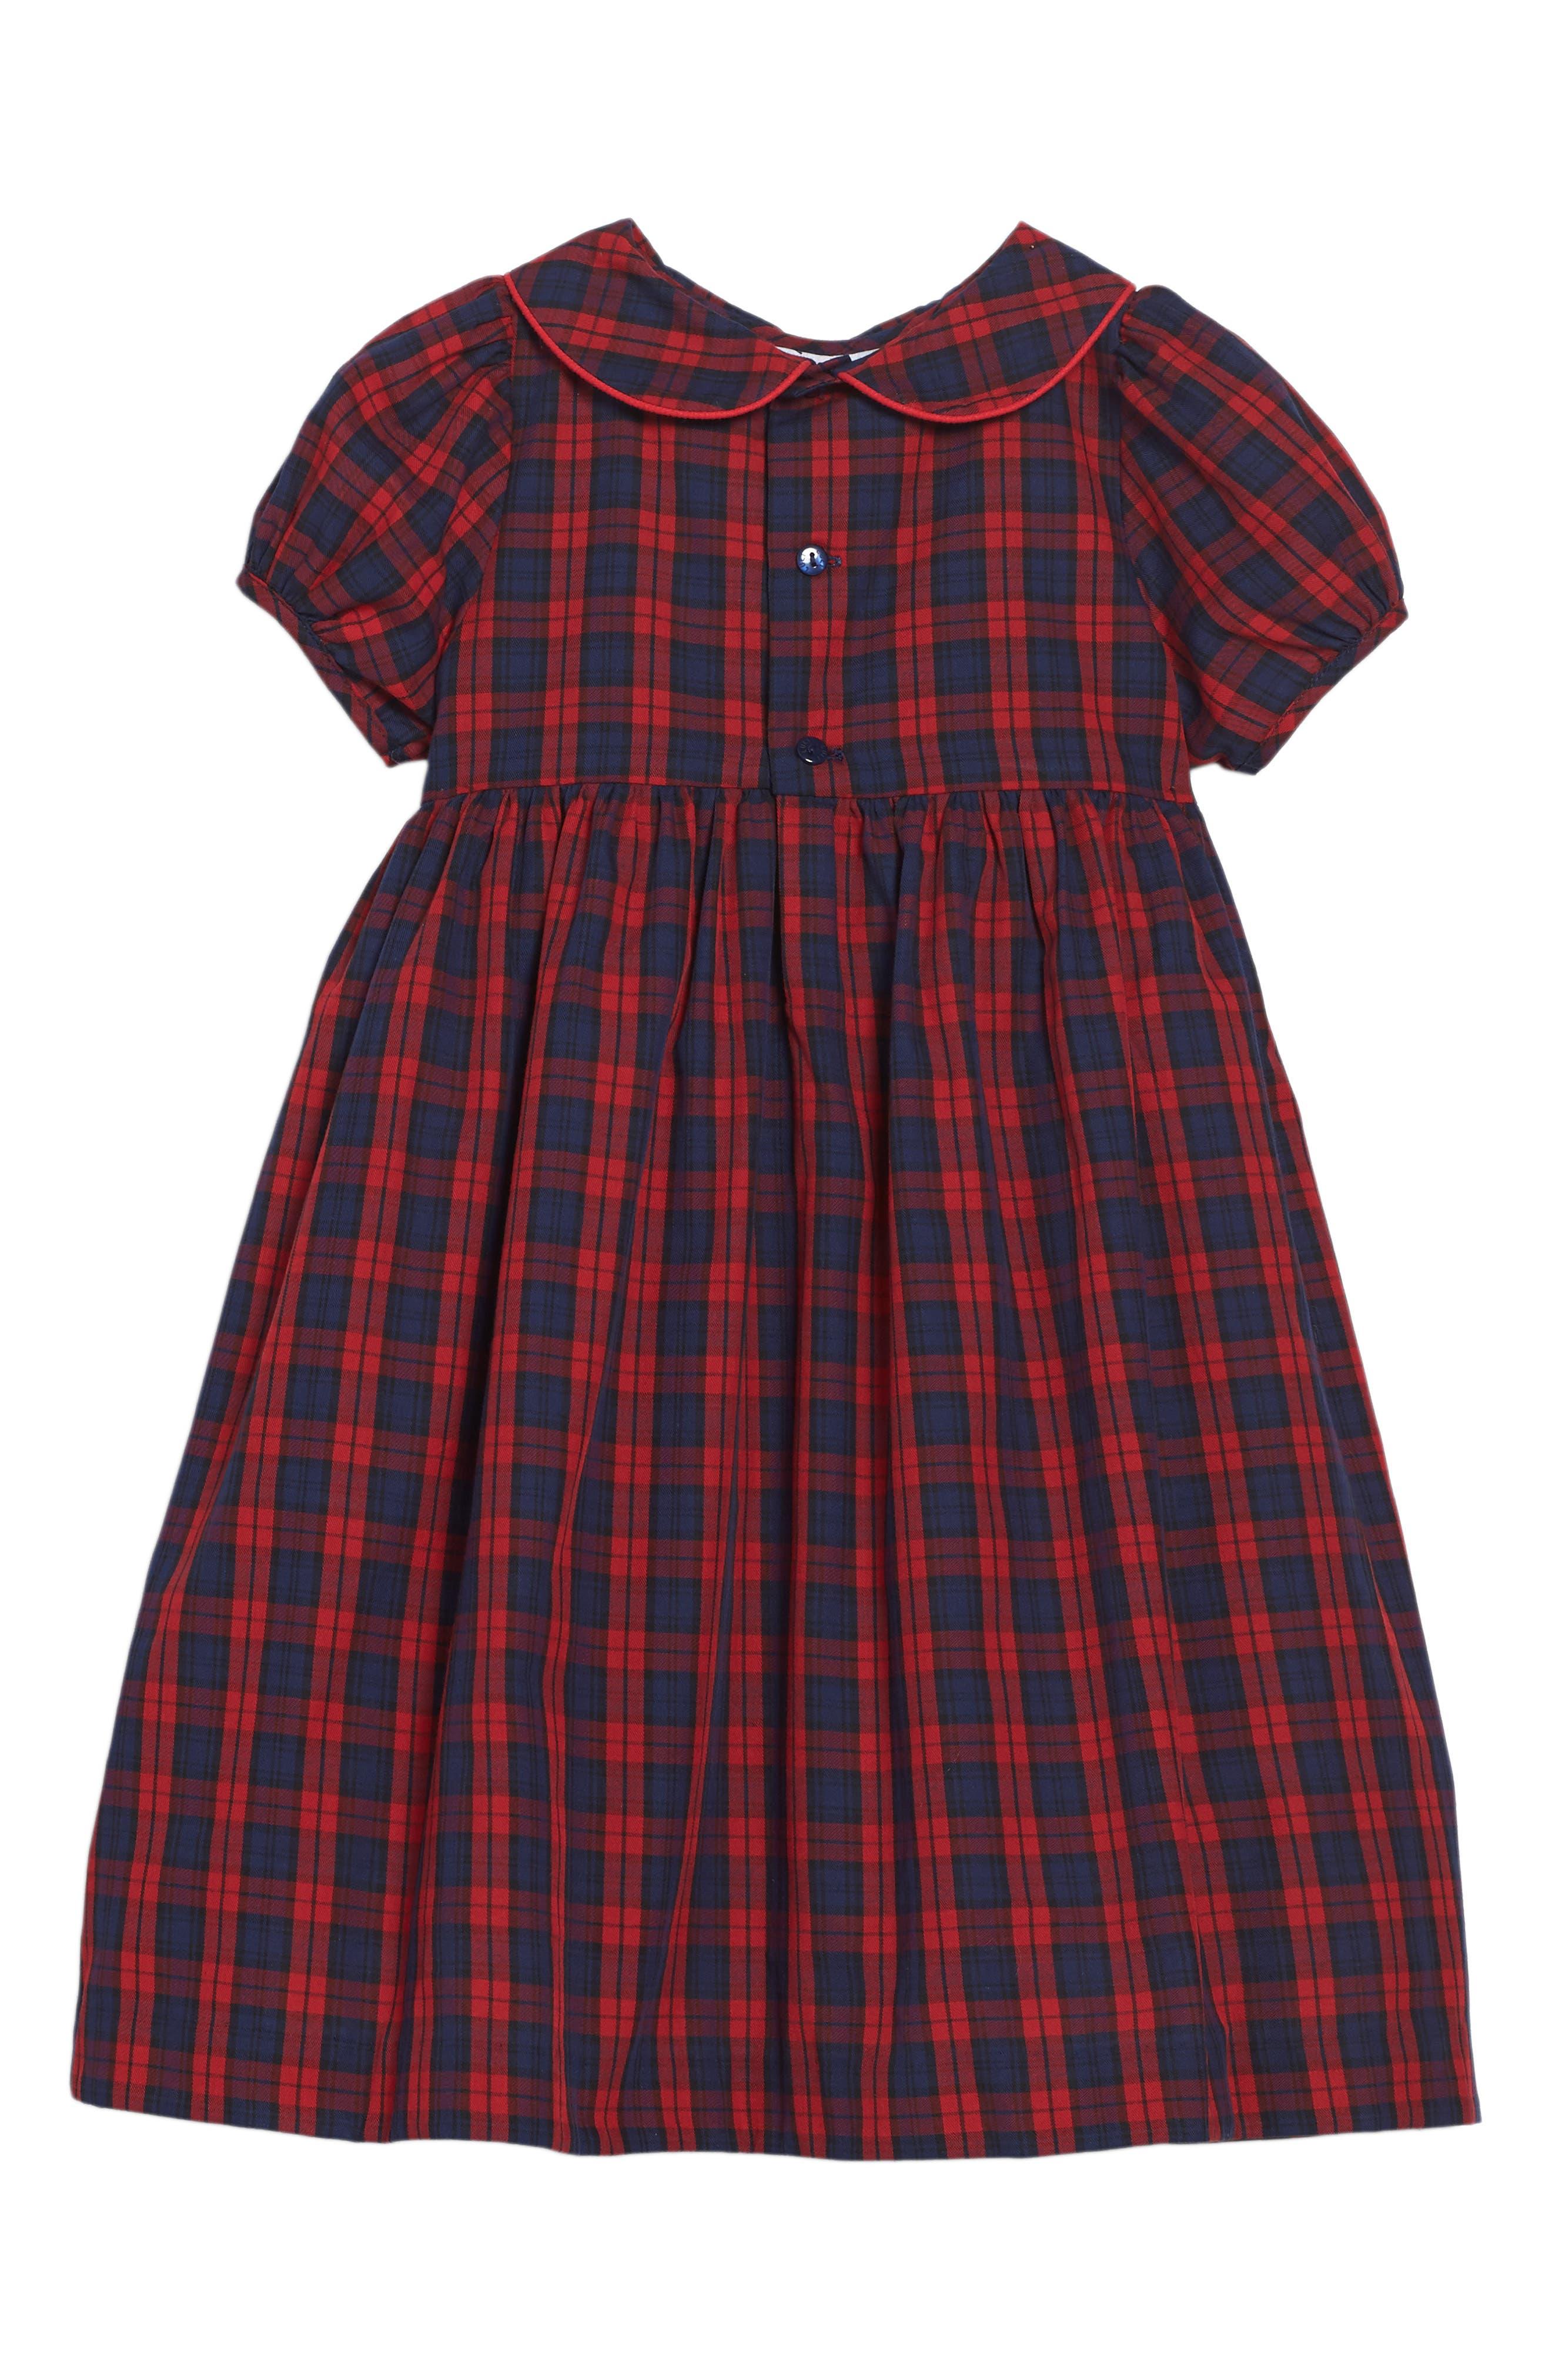 Plaid Dress,                             Alternate thumbnail 2, color,                             600